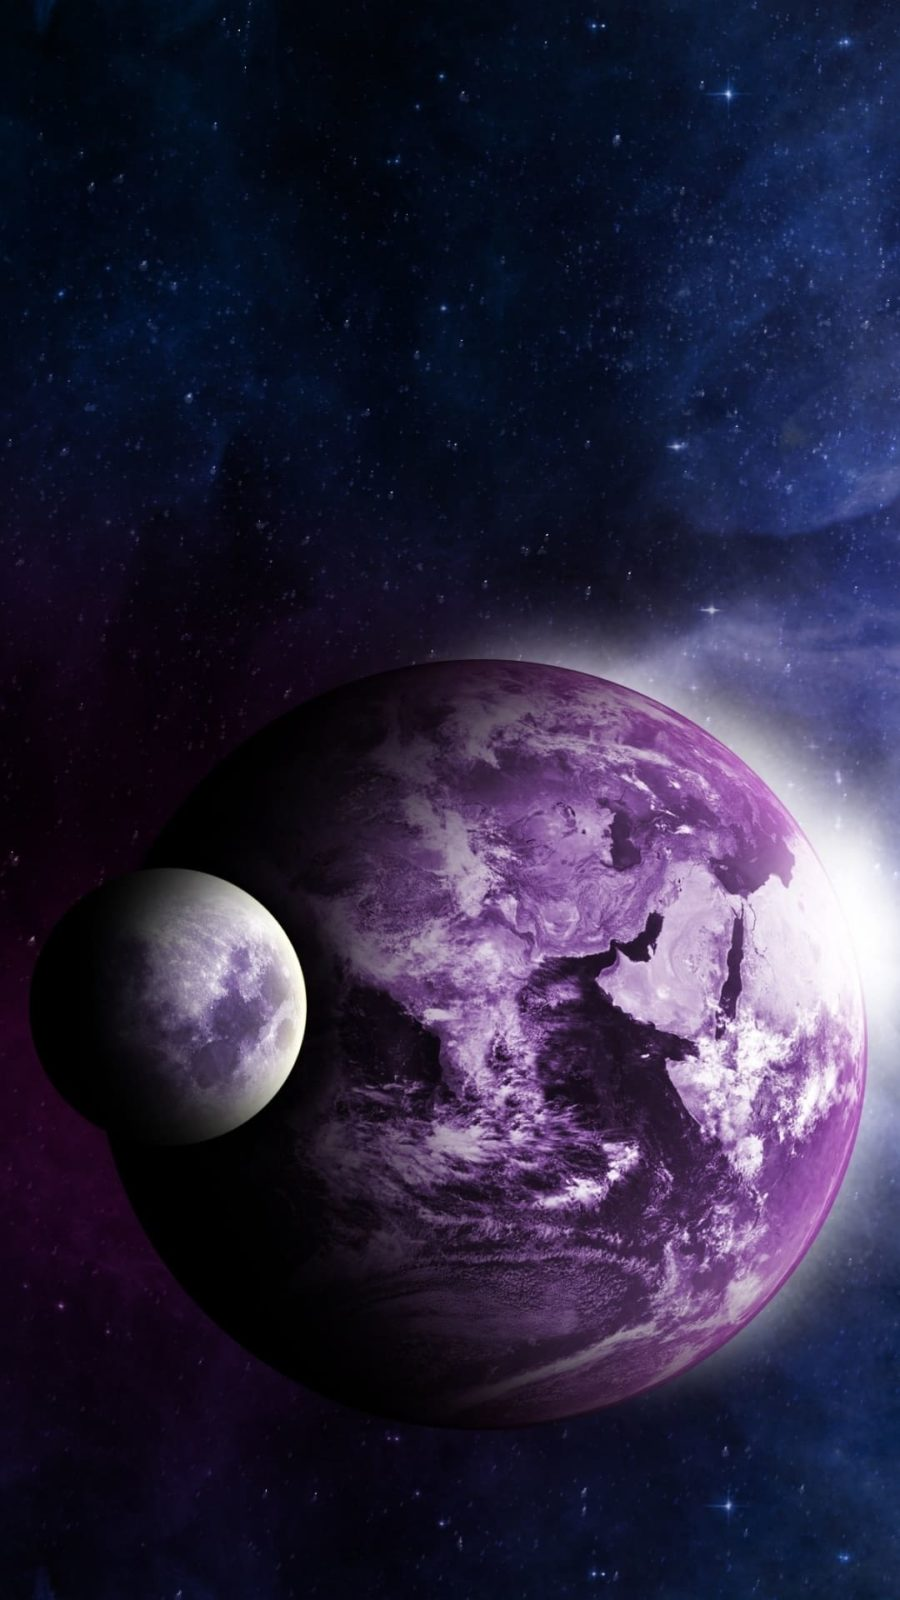 Обои космос на телефон 66